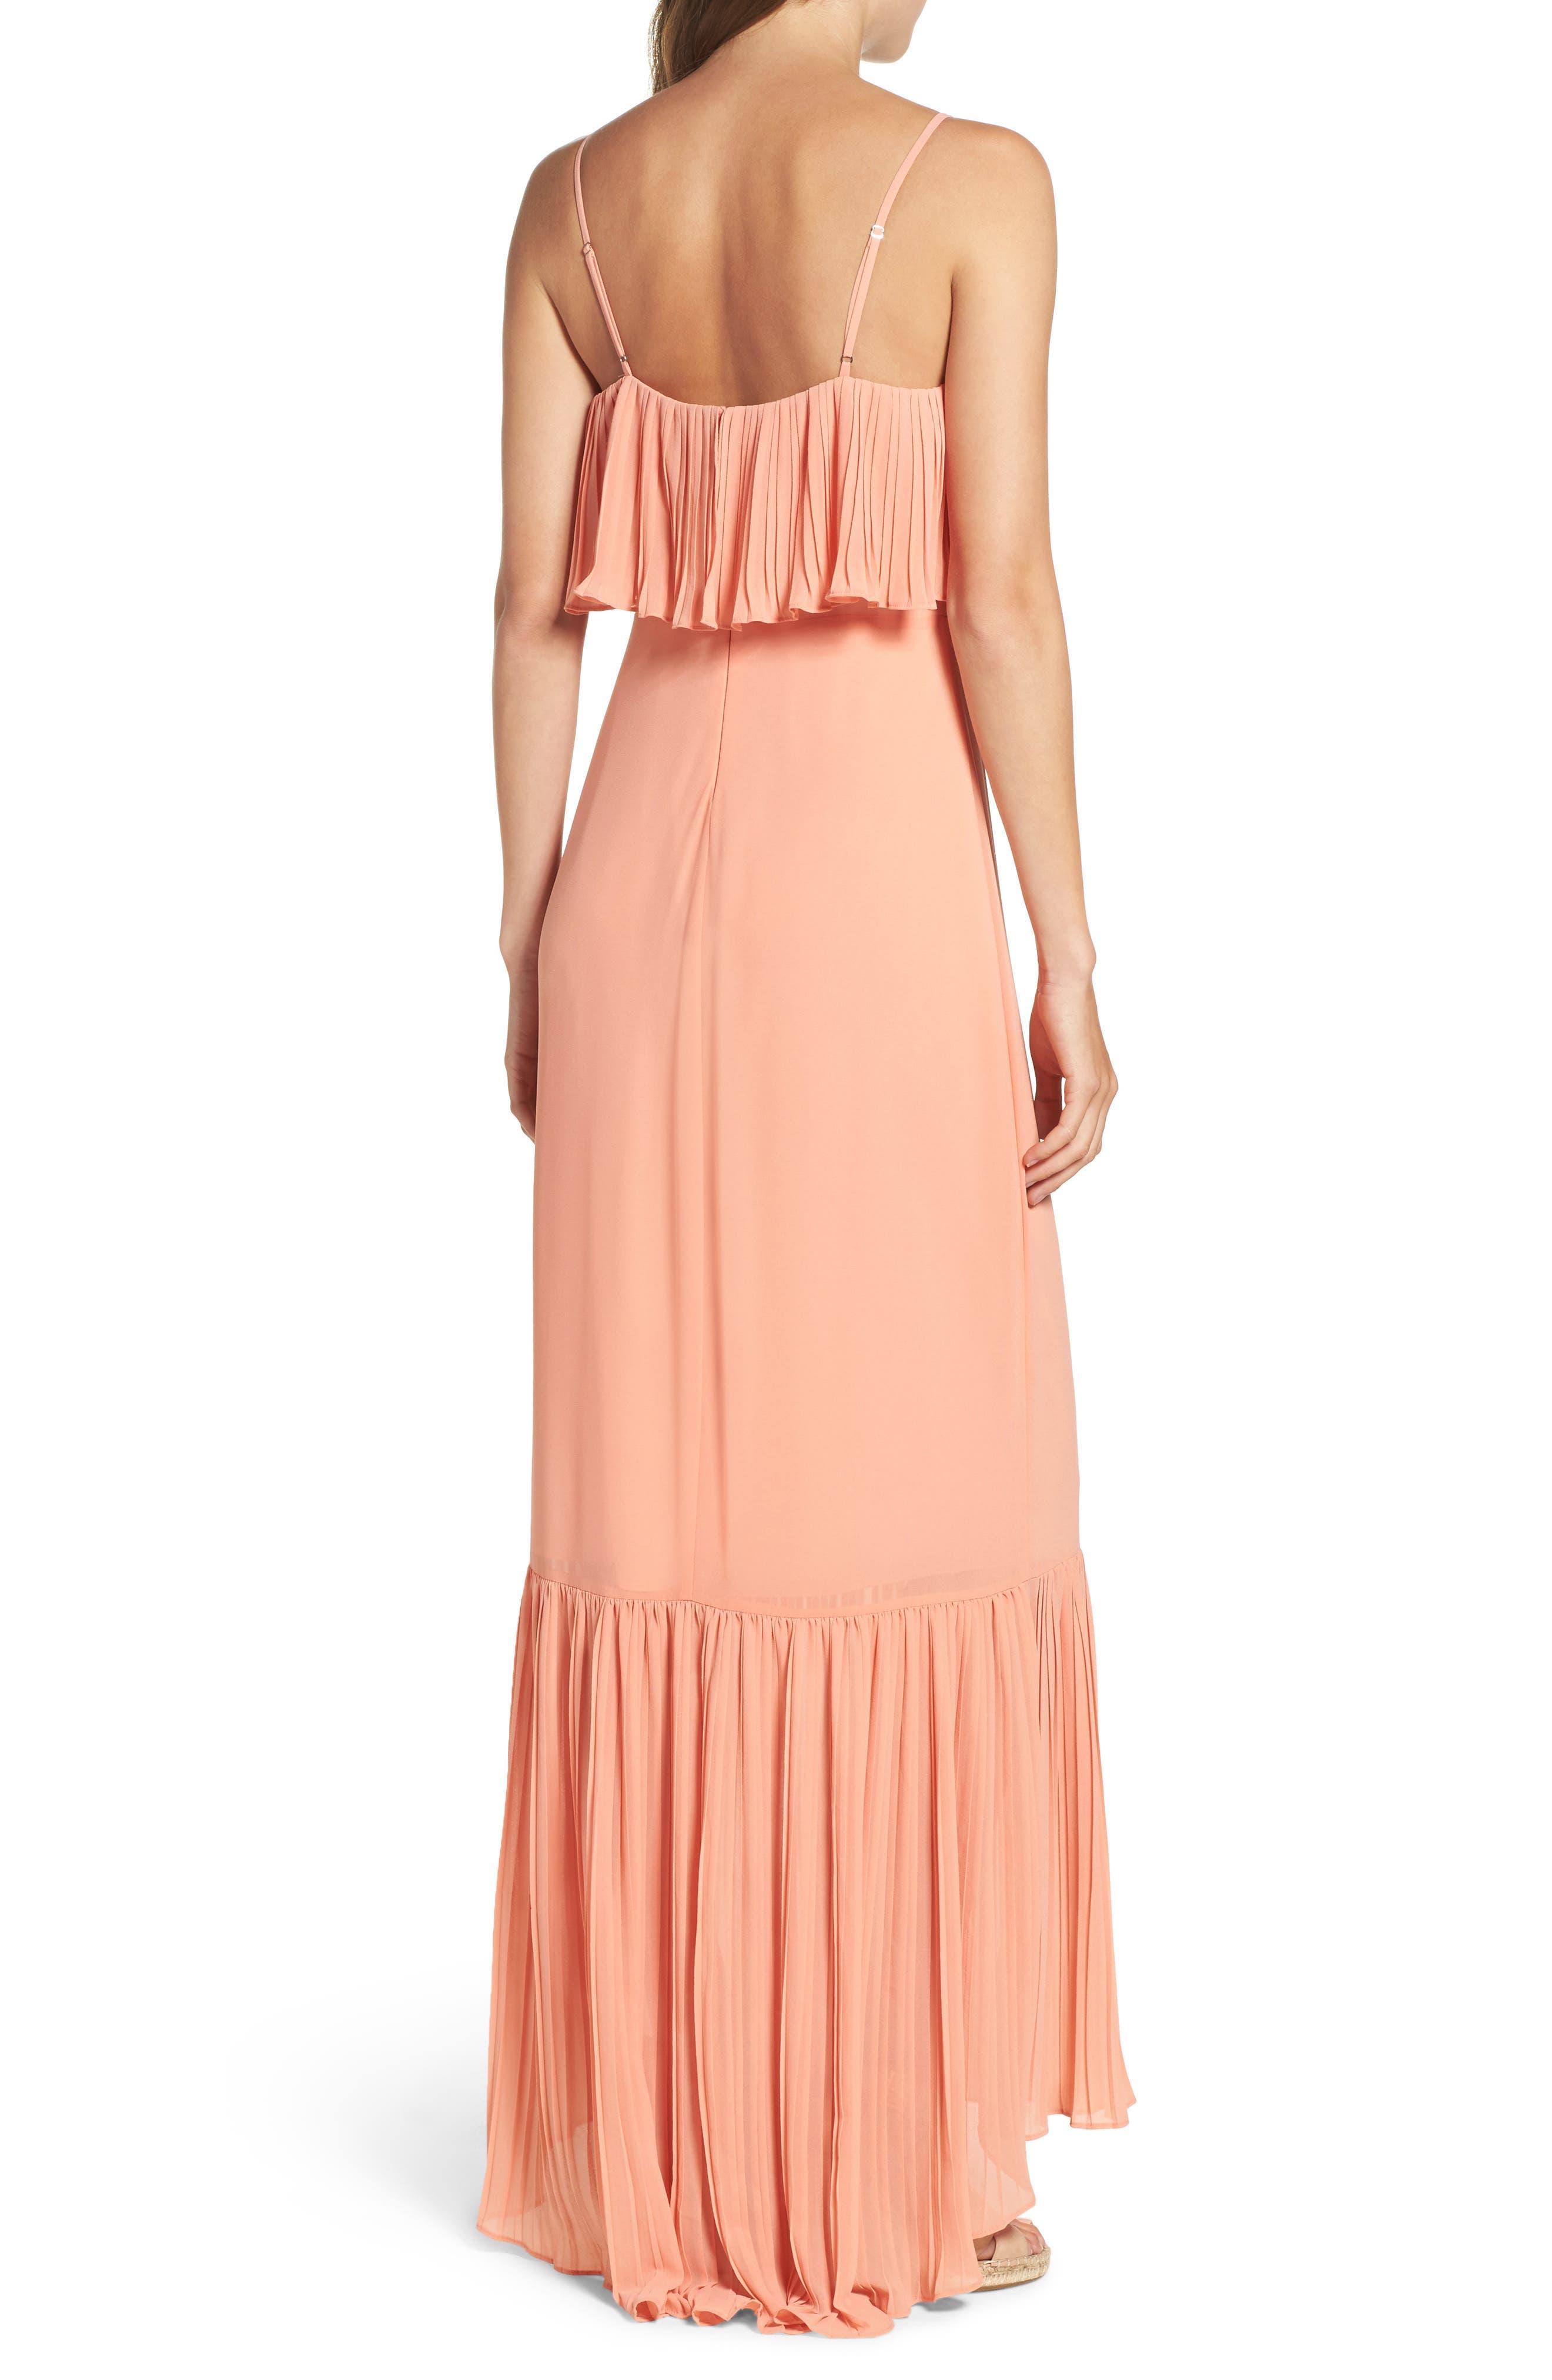 Moroccan Villa Maxi Dress,                             Alternate thumbnail 3, color,                             Desert Sunset